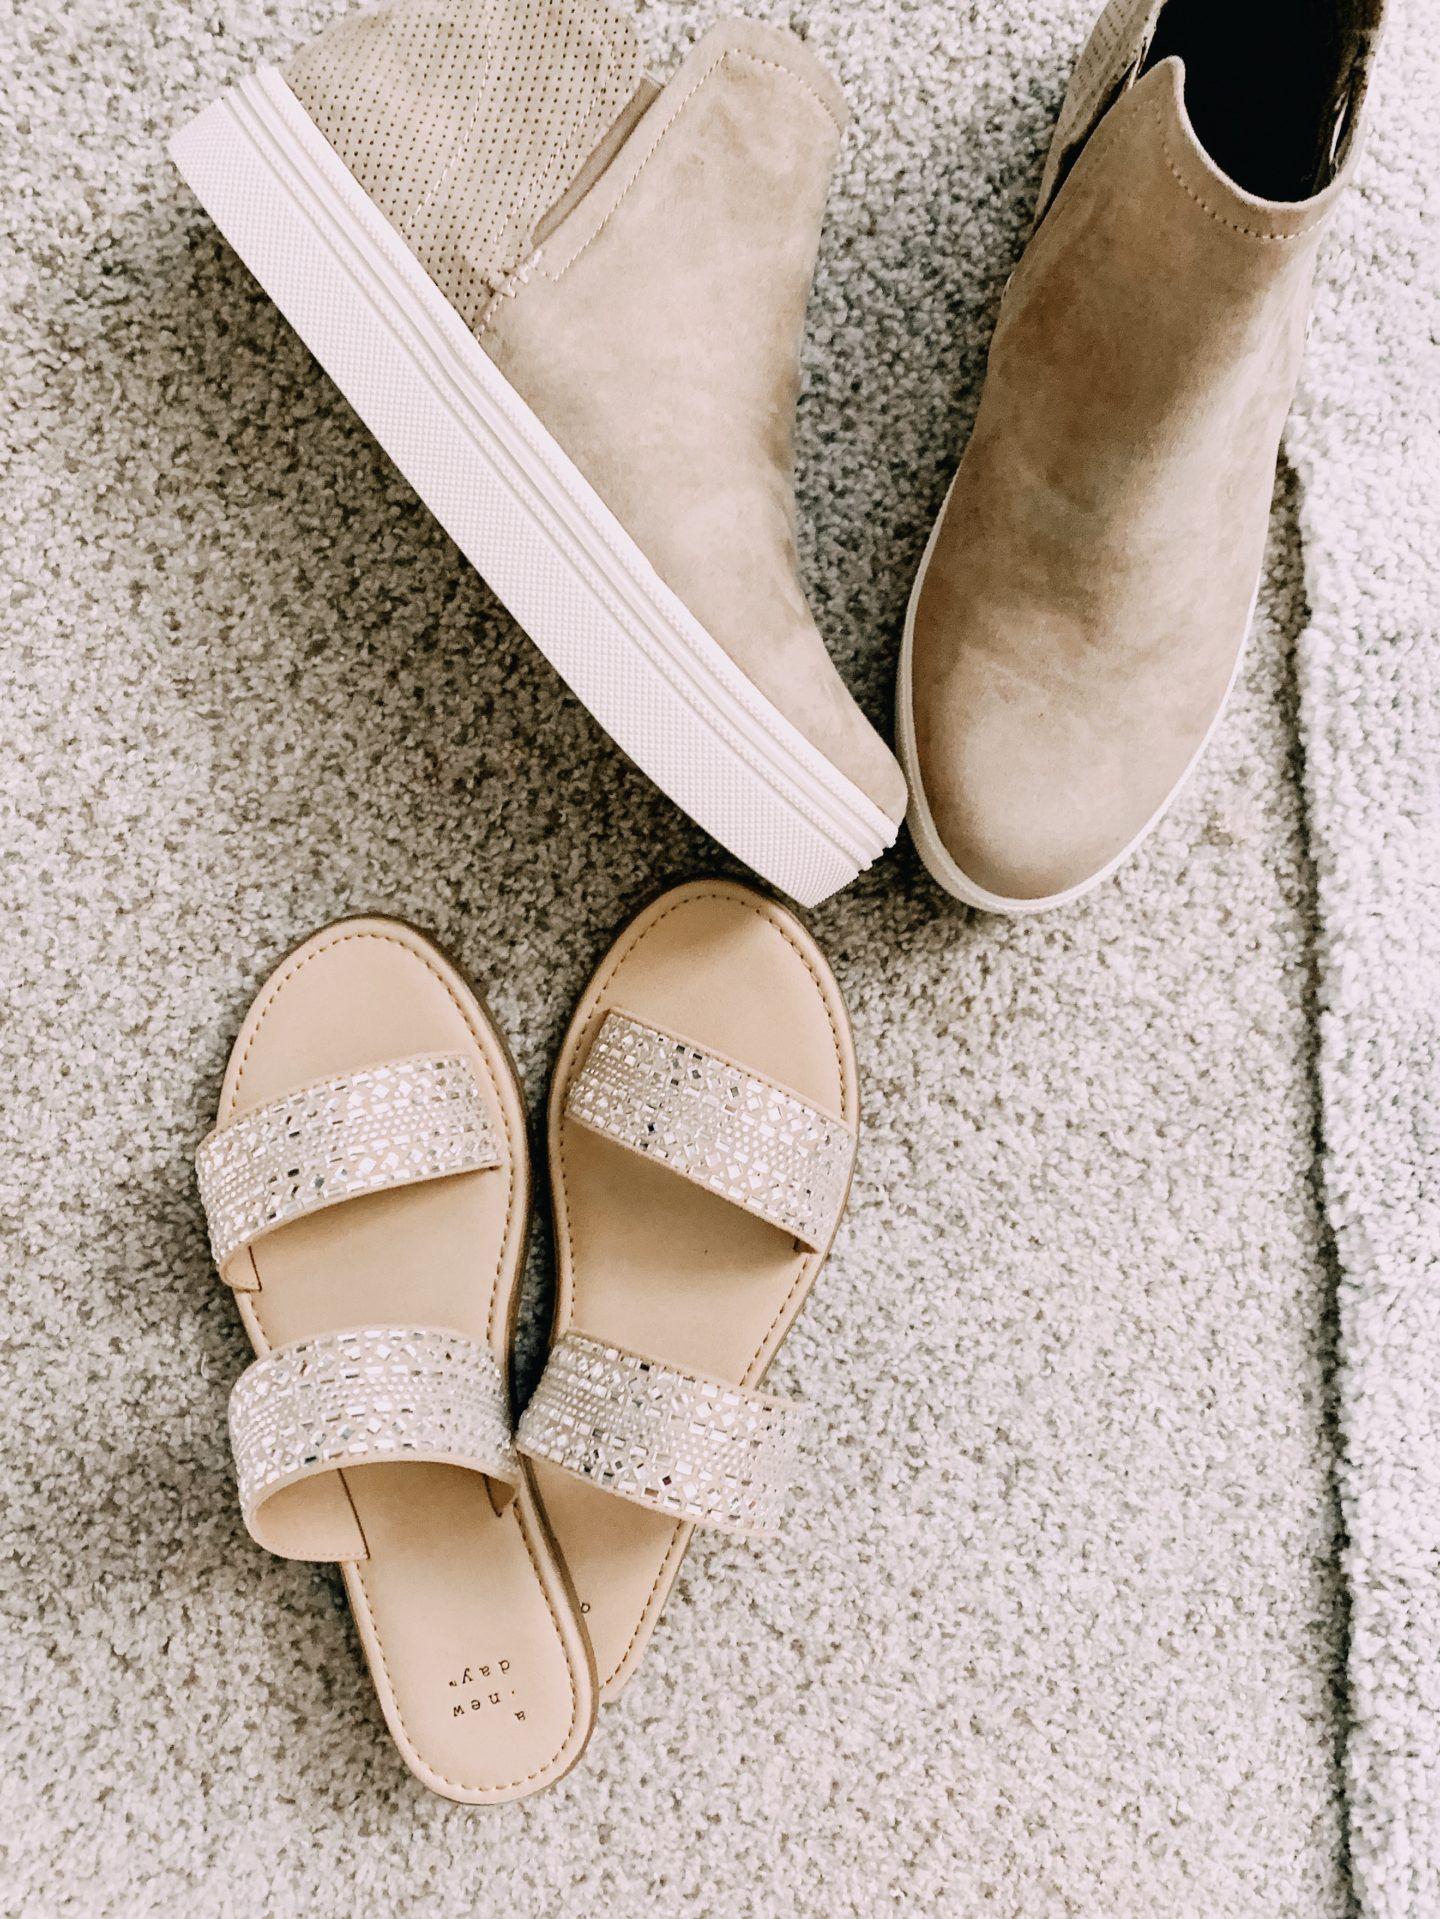 80900591717 spring shoe haul